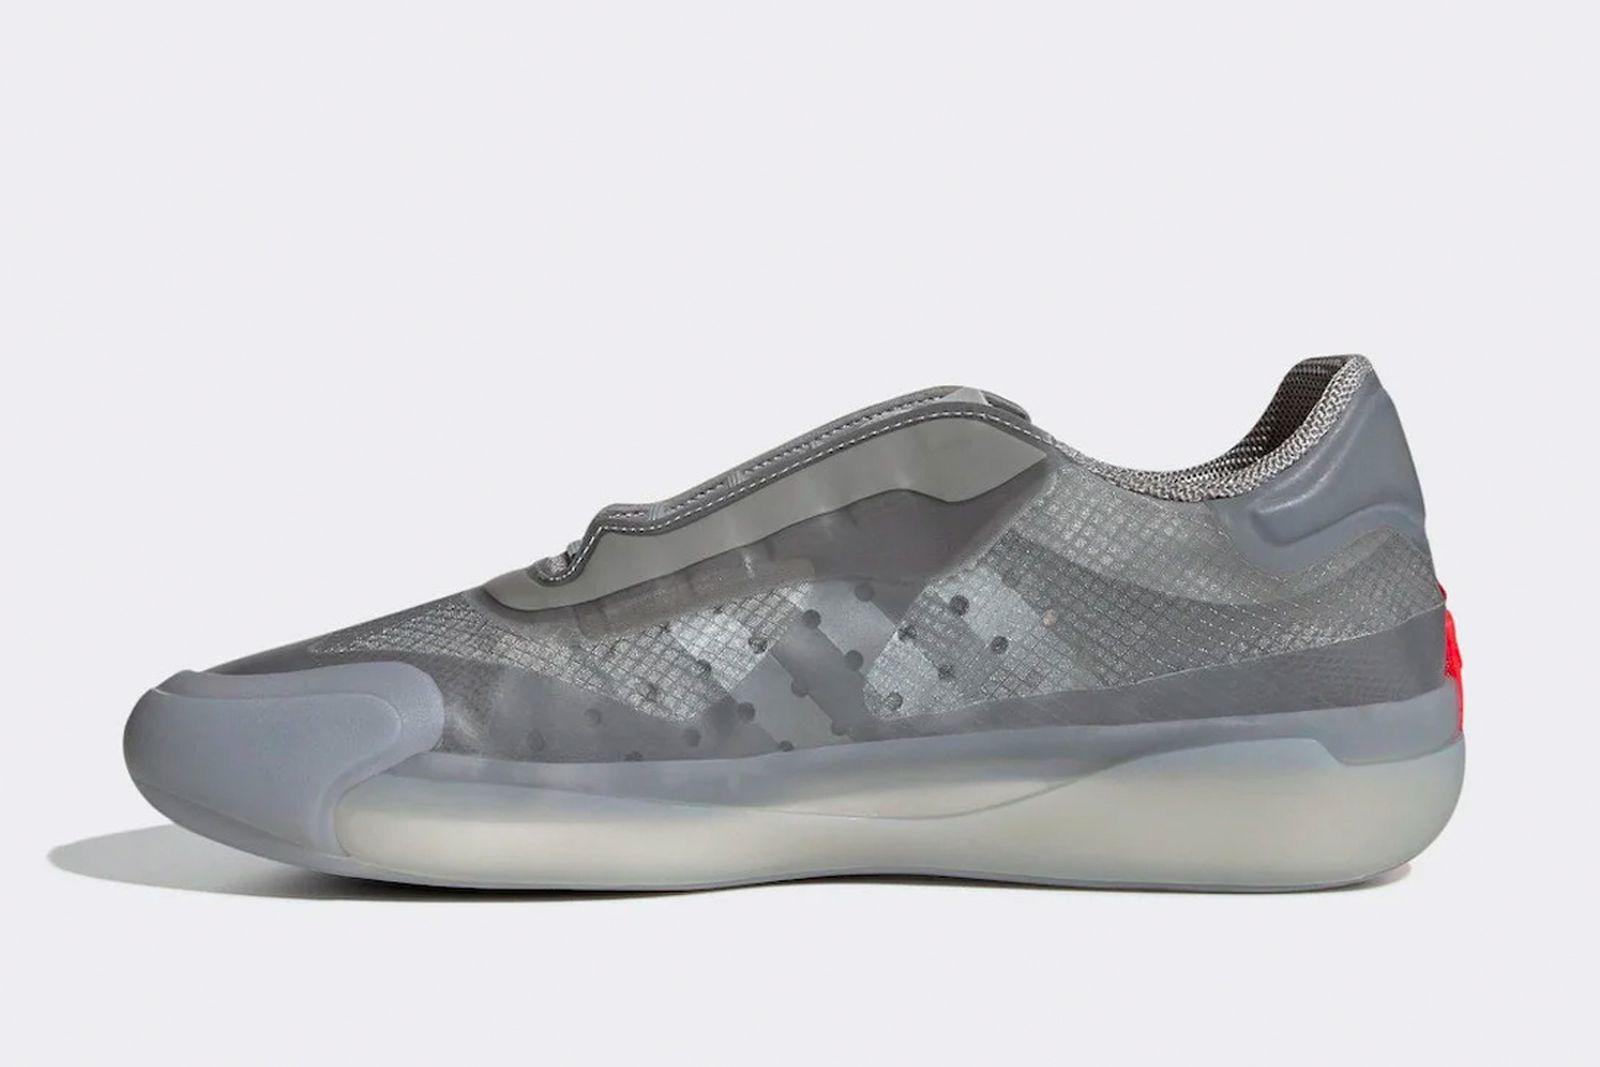 prada-adidas-luna-rossa-21-silver-release-date-price-02